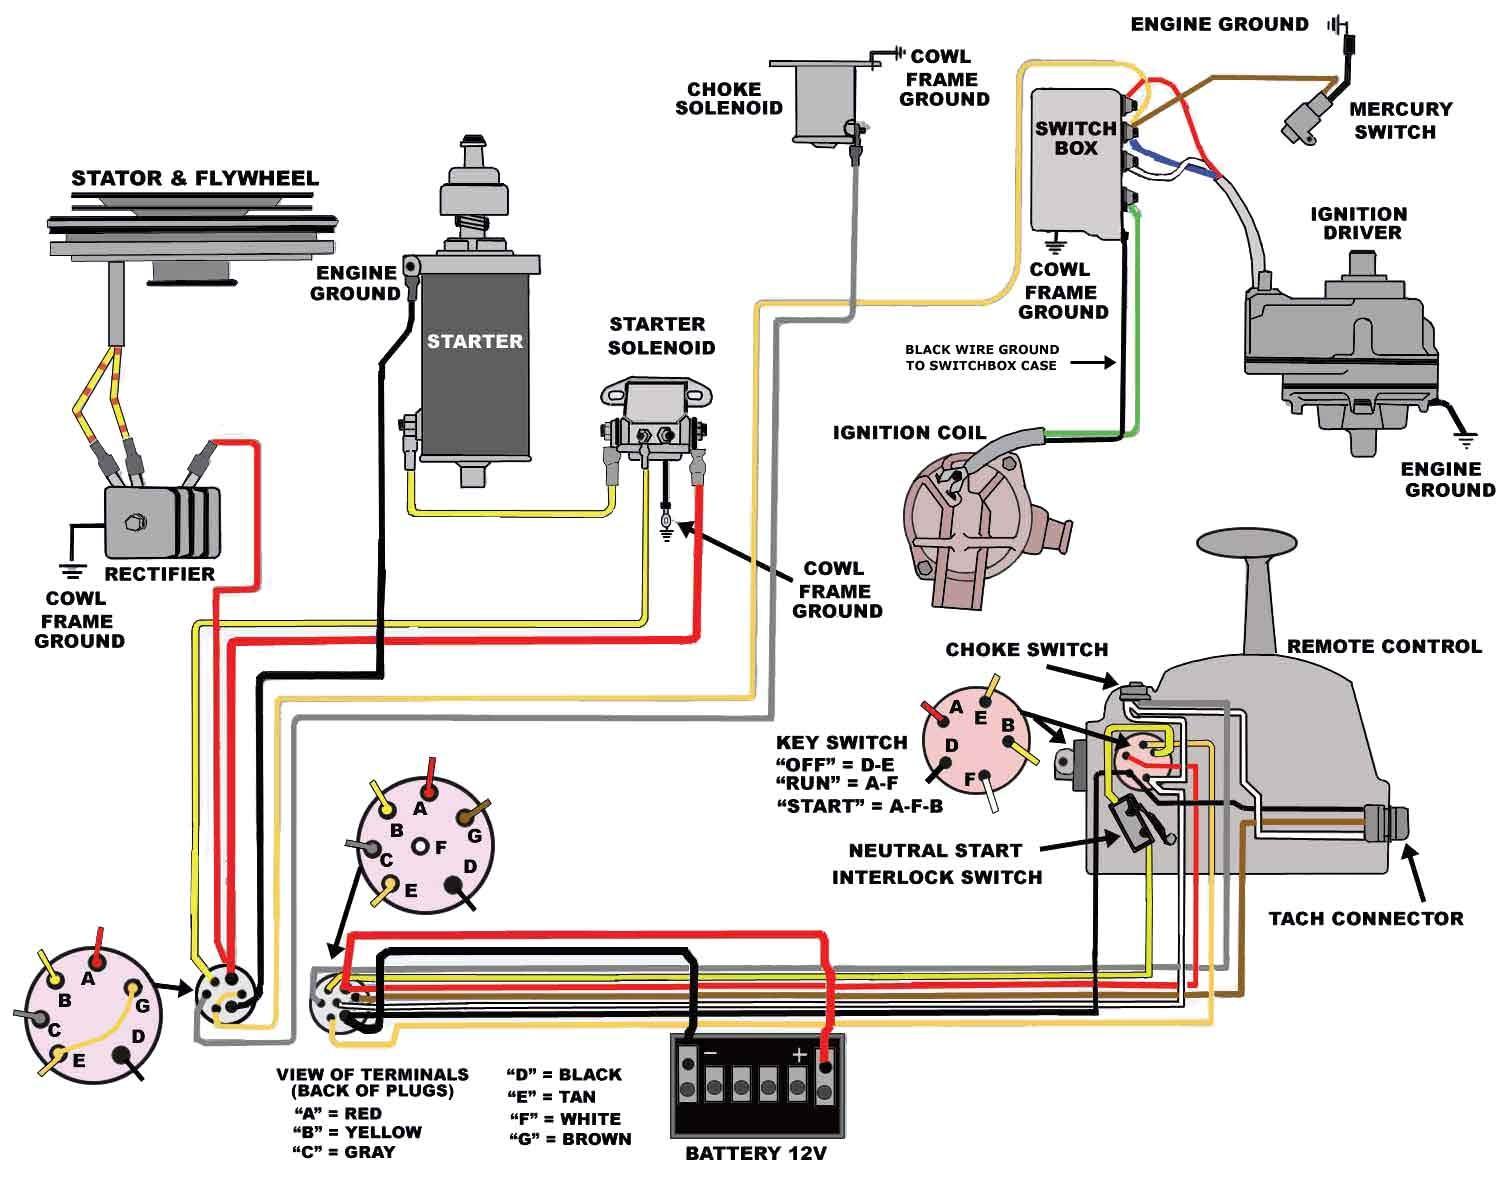 mercontrol control box diagram schematic diagrams quicksilver shifter  diagram mercontrol remote control diagram auto electrical wiring